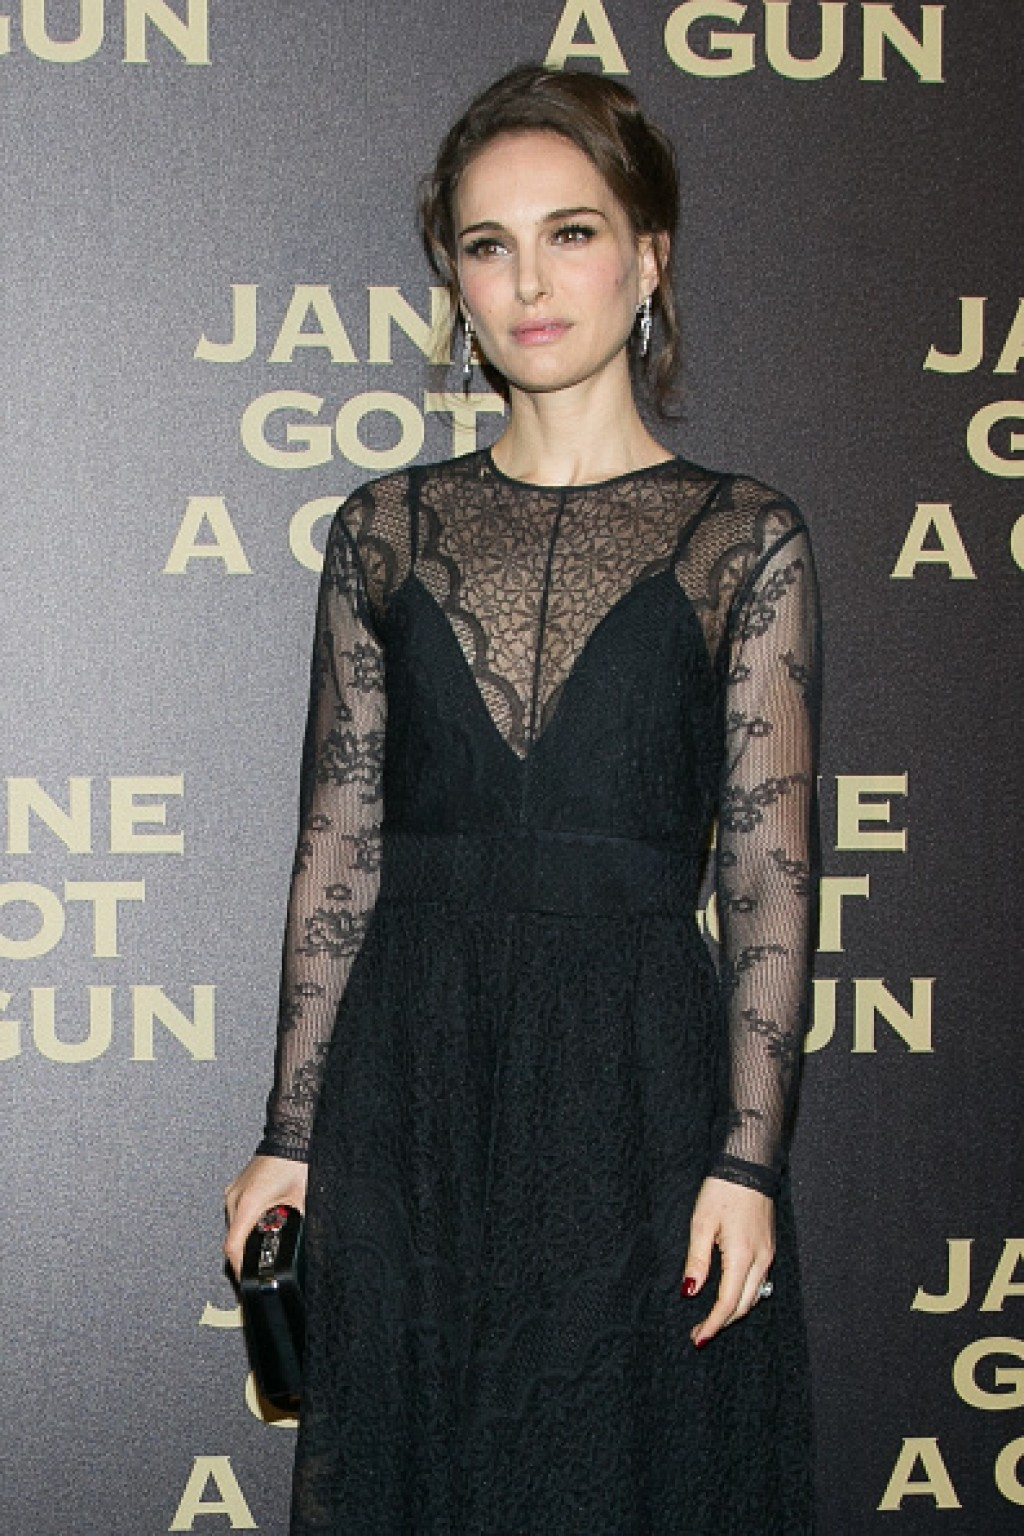 Jane-Got-A-Gun-Paris-Premiere-Natalie-Portman-2016-1024x1536